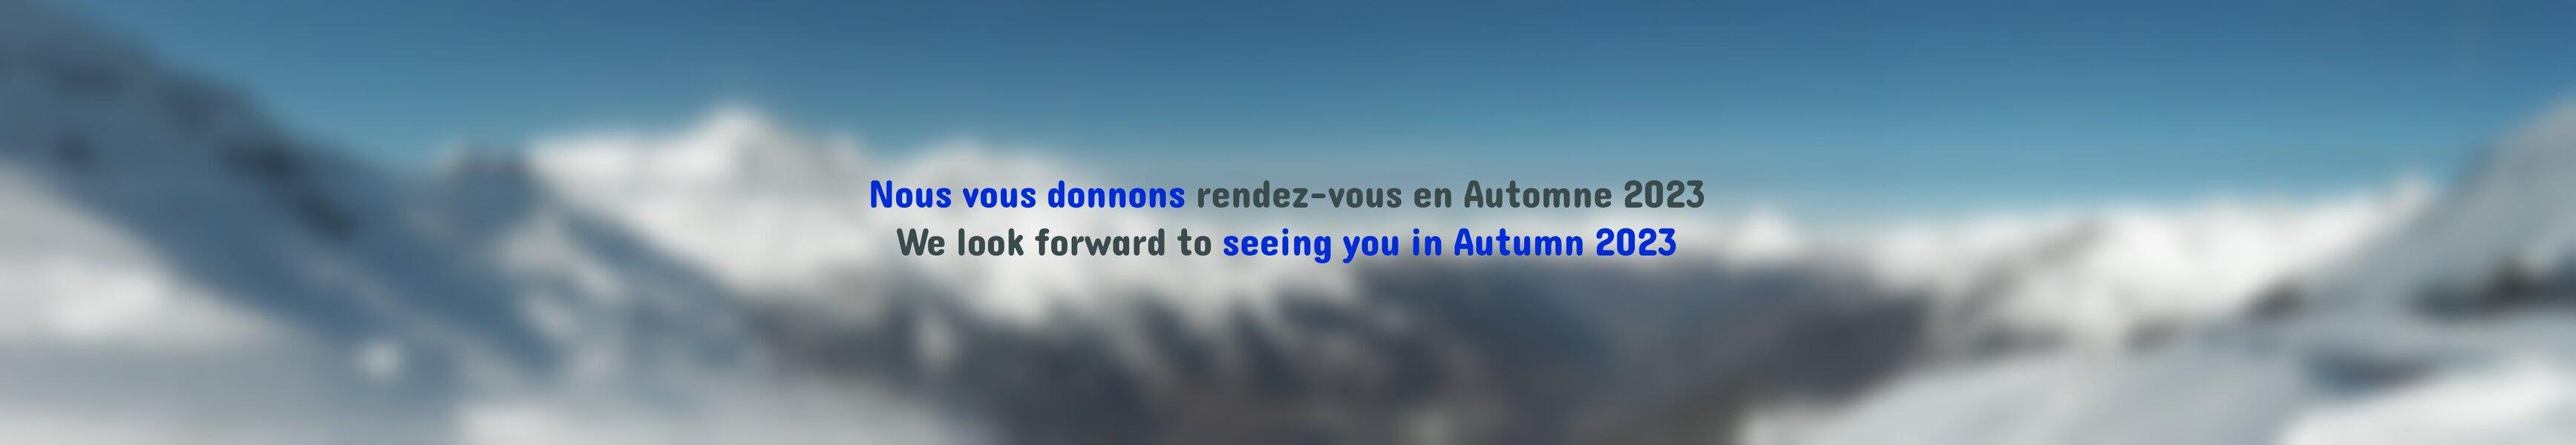 Sainte Foy webcam - La Marquise ski lift